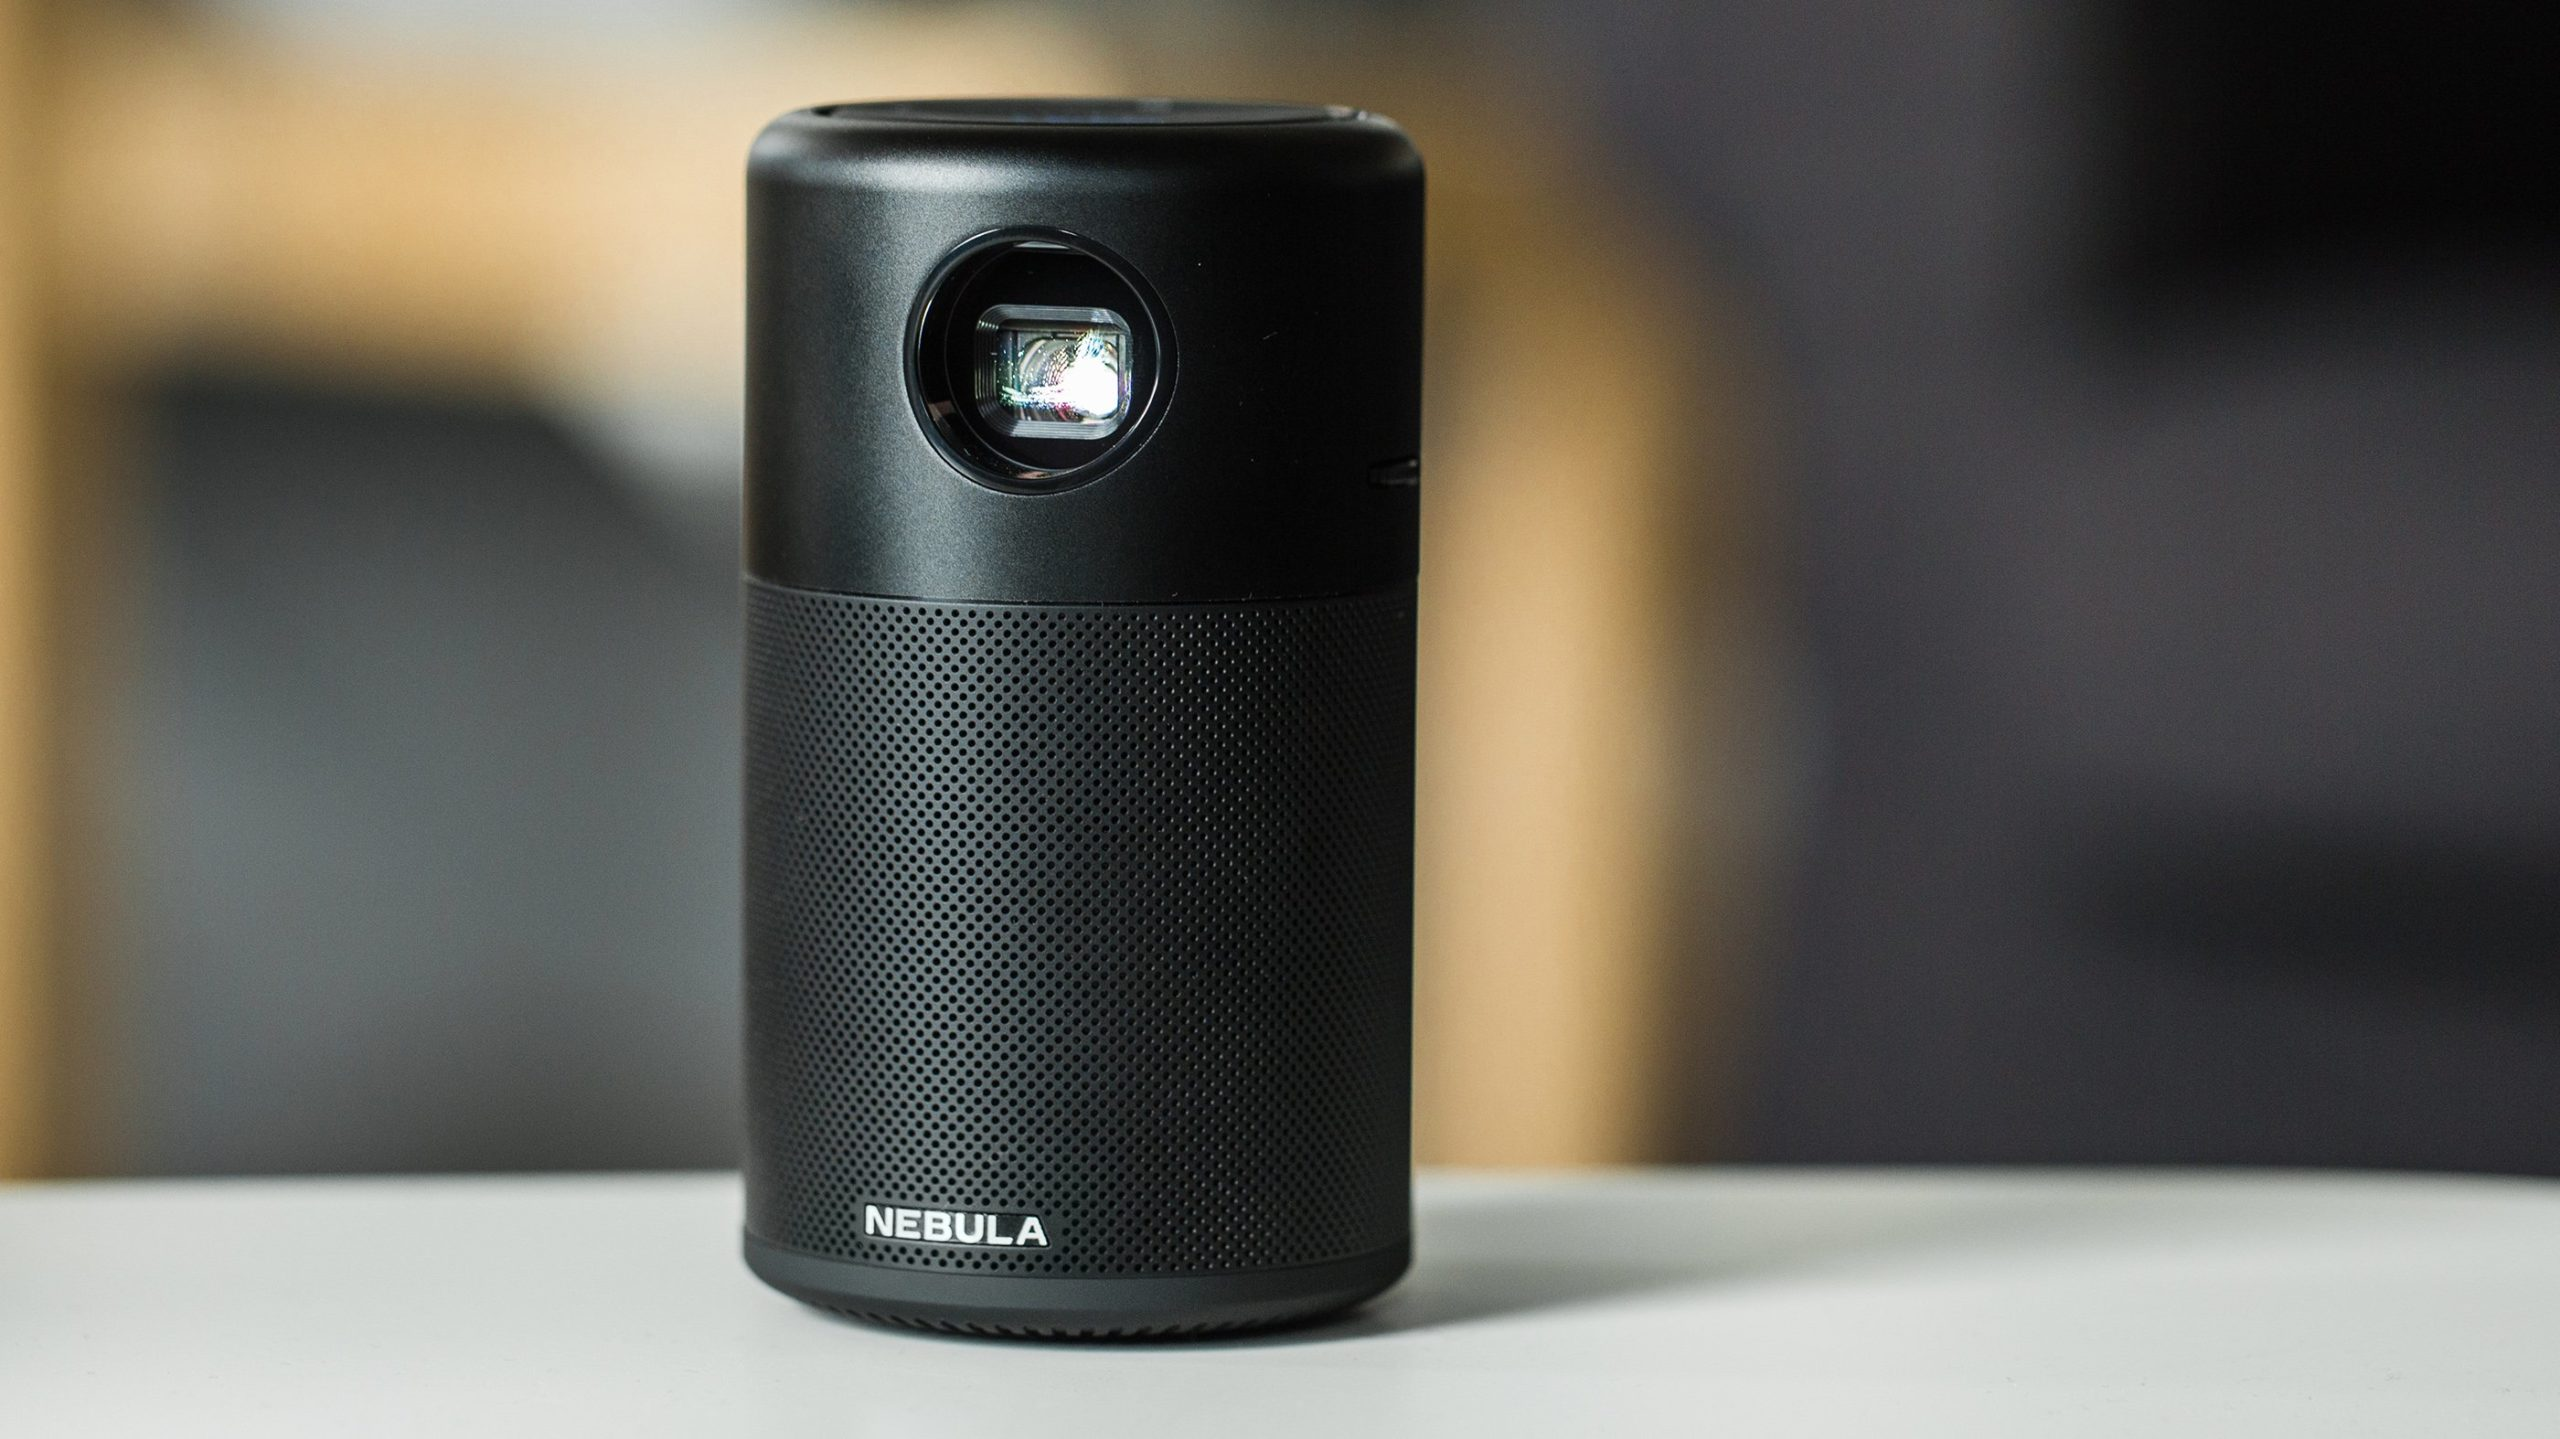 nebula proiettore portatile